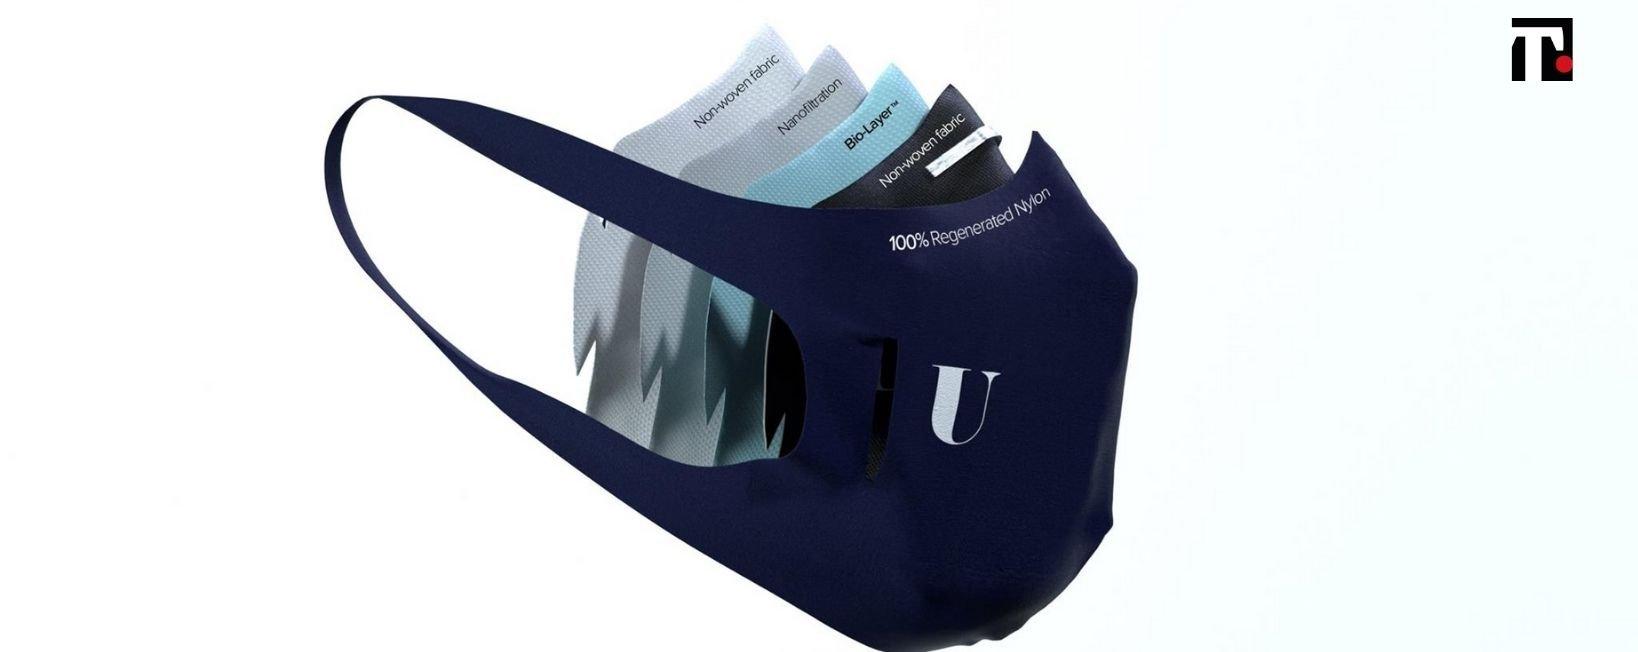 sanzioni per mascherine u mask